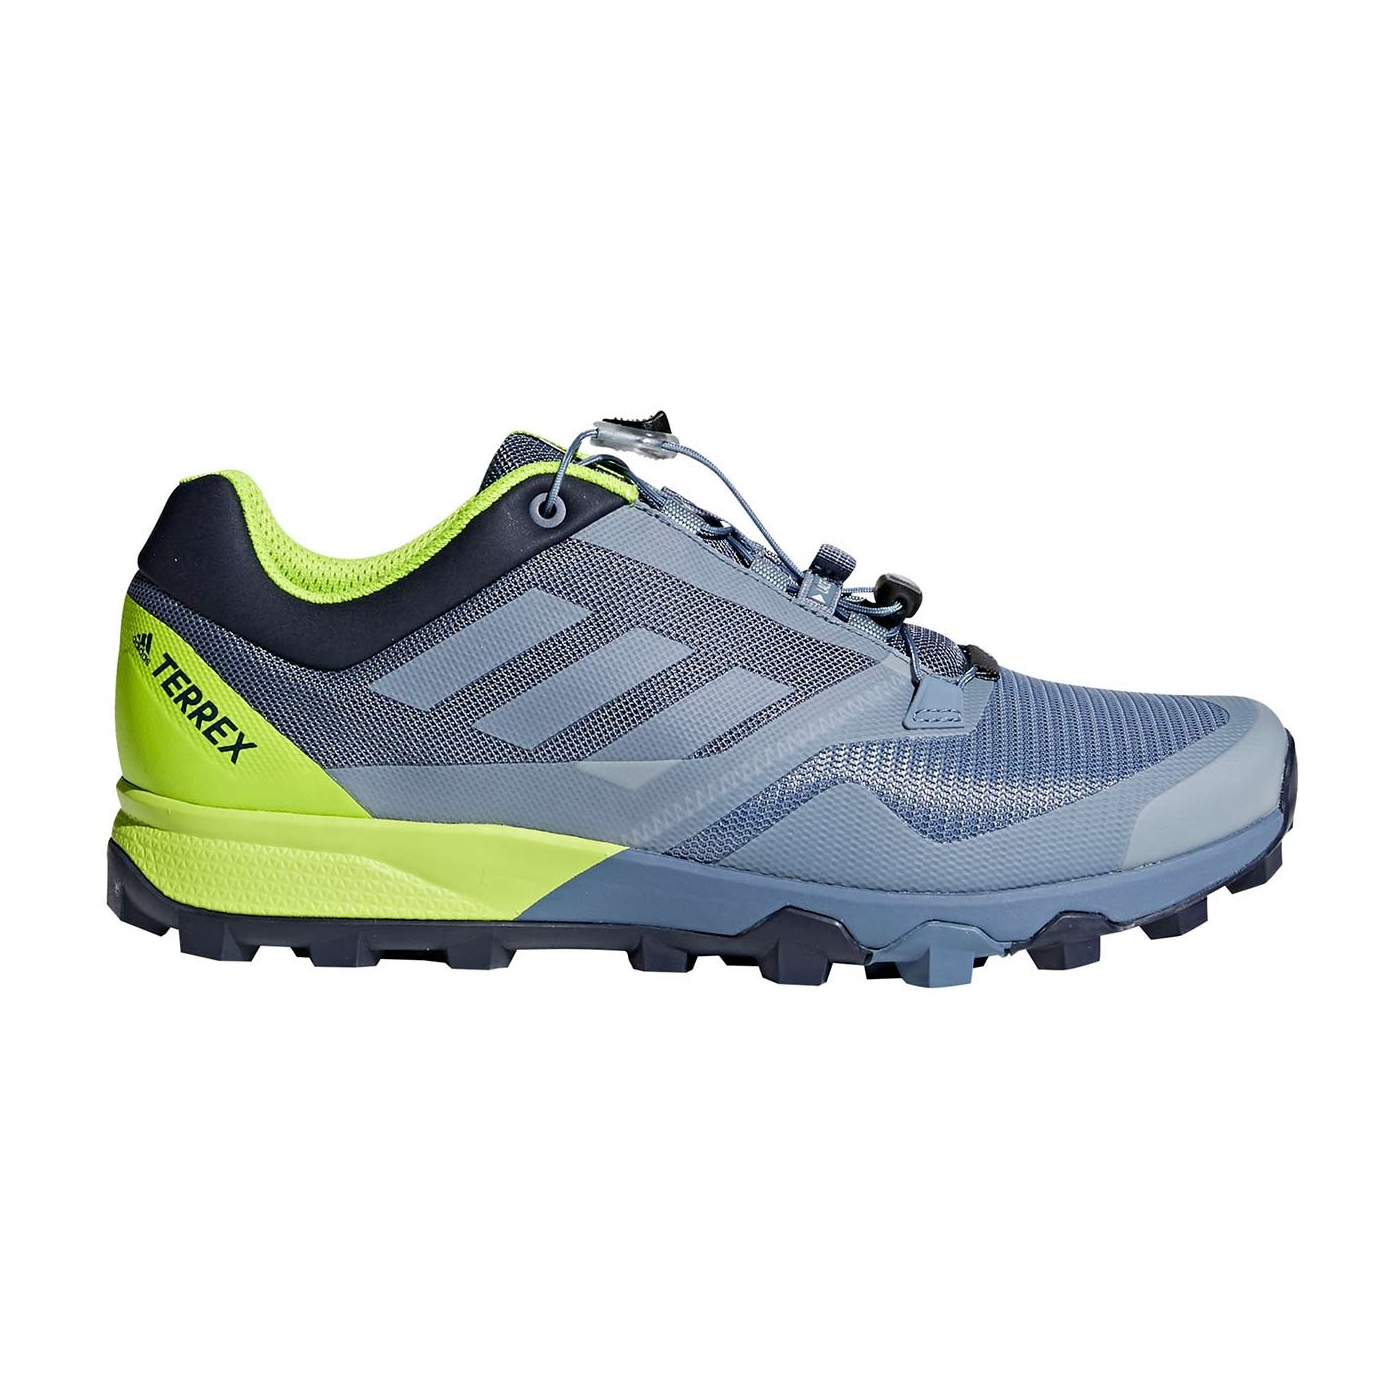 Chaussures Trail Adidas Terrex Trail Maker Raw Steel